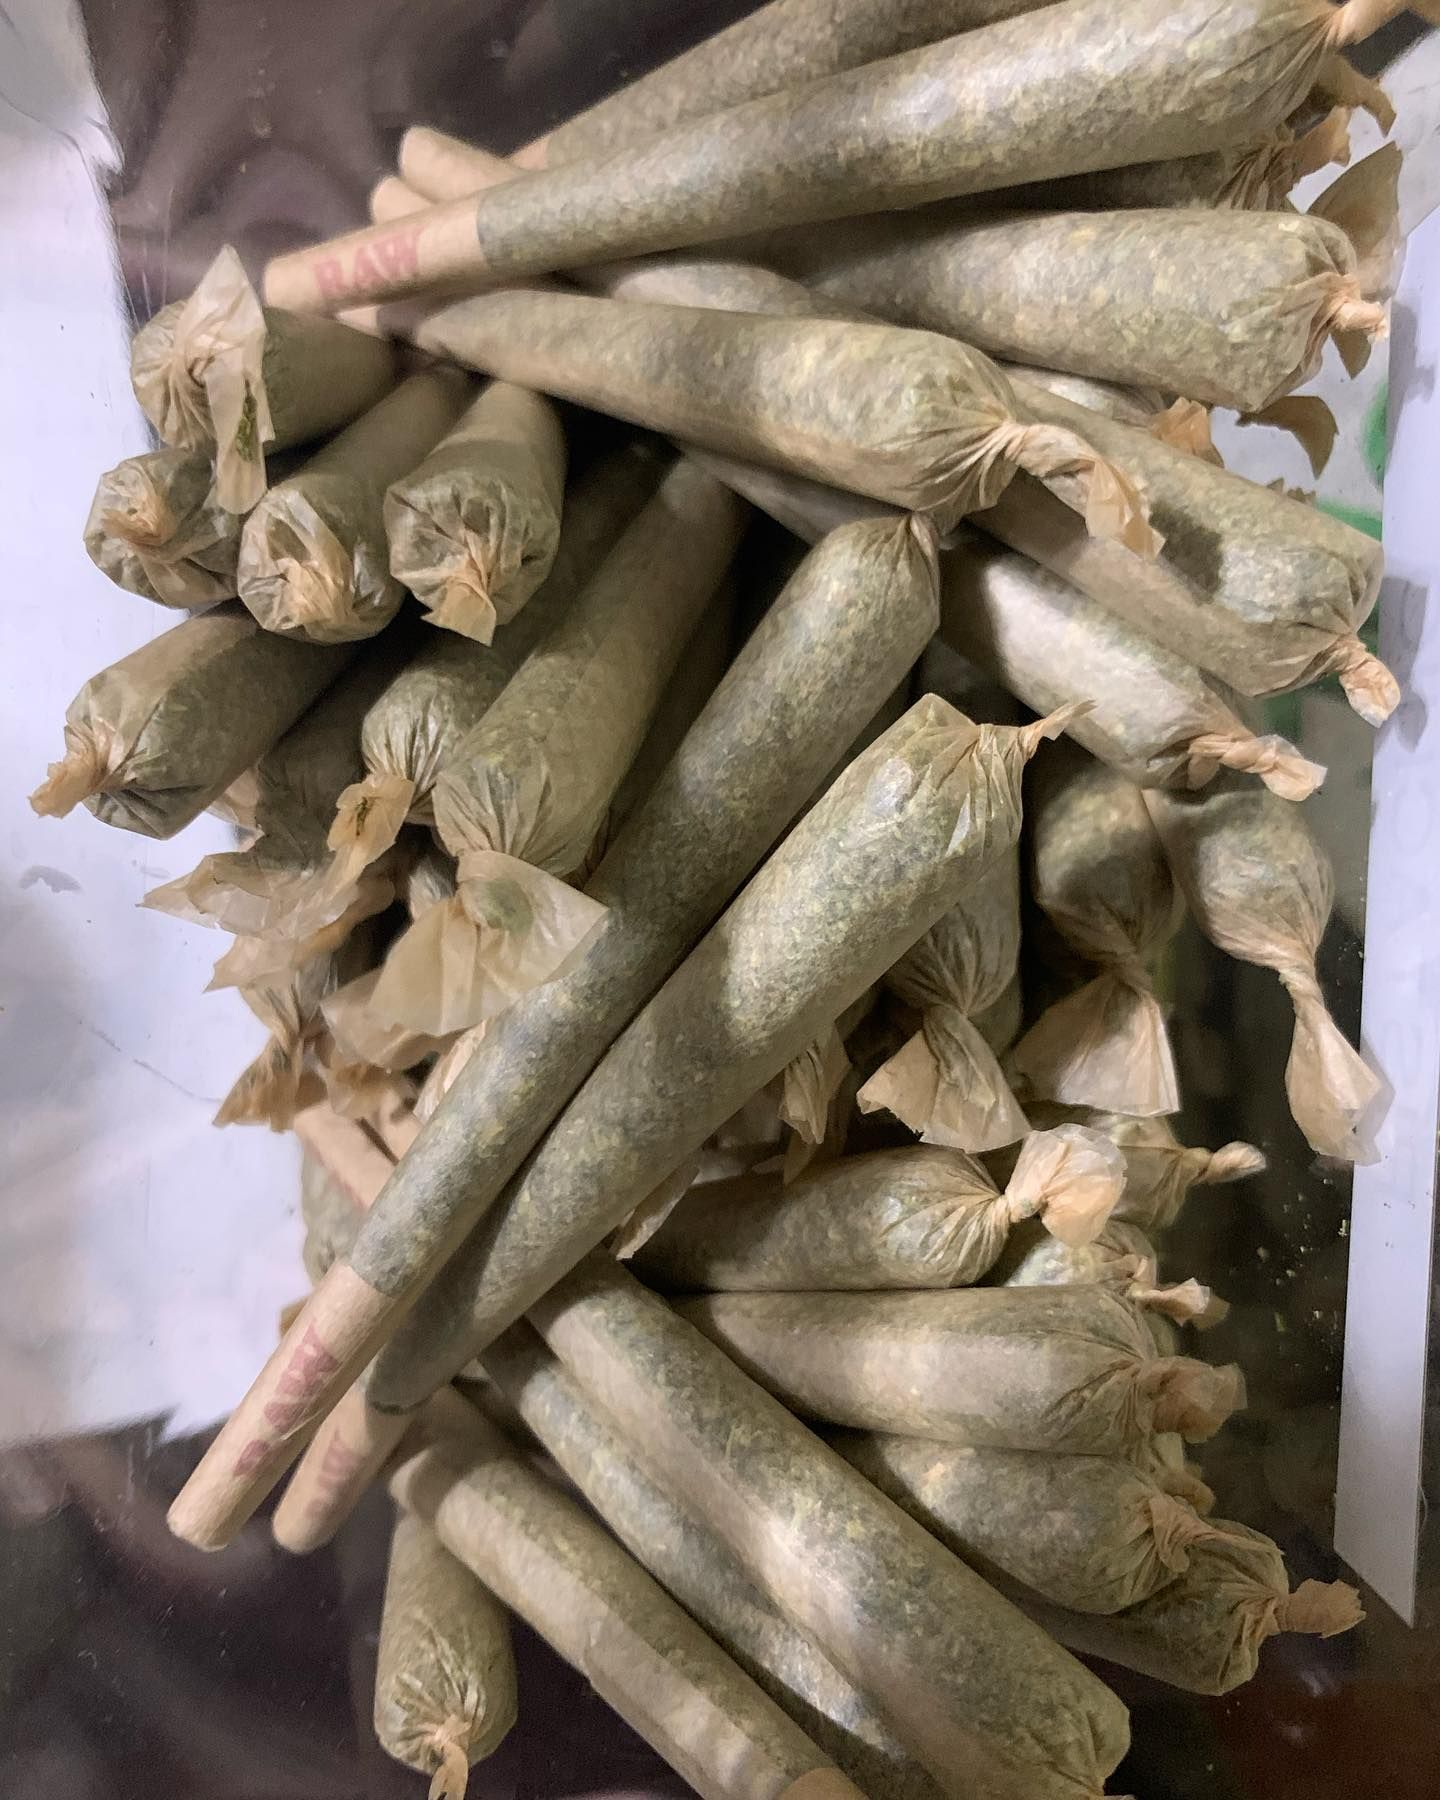 Special Sauce Pre-Rolls🚀🌝 . .  #moonmen #cbd #cbdprerolls #cbdflowers #cbdoil #cbdproducts #cbdhealth #cbdmovement #cbdlife #cbdheals #cbdcommunity #cbdwellness #cbdbenefits #cbdflowers #cbdteachallenge #cbdoilbenefits #cbdvape#cbdeducation #cbdwholesale #cbdlove #cbdforanxiety #cbdoilforsale #cbdstore #cbdmedicine